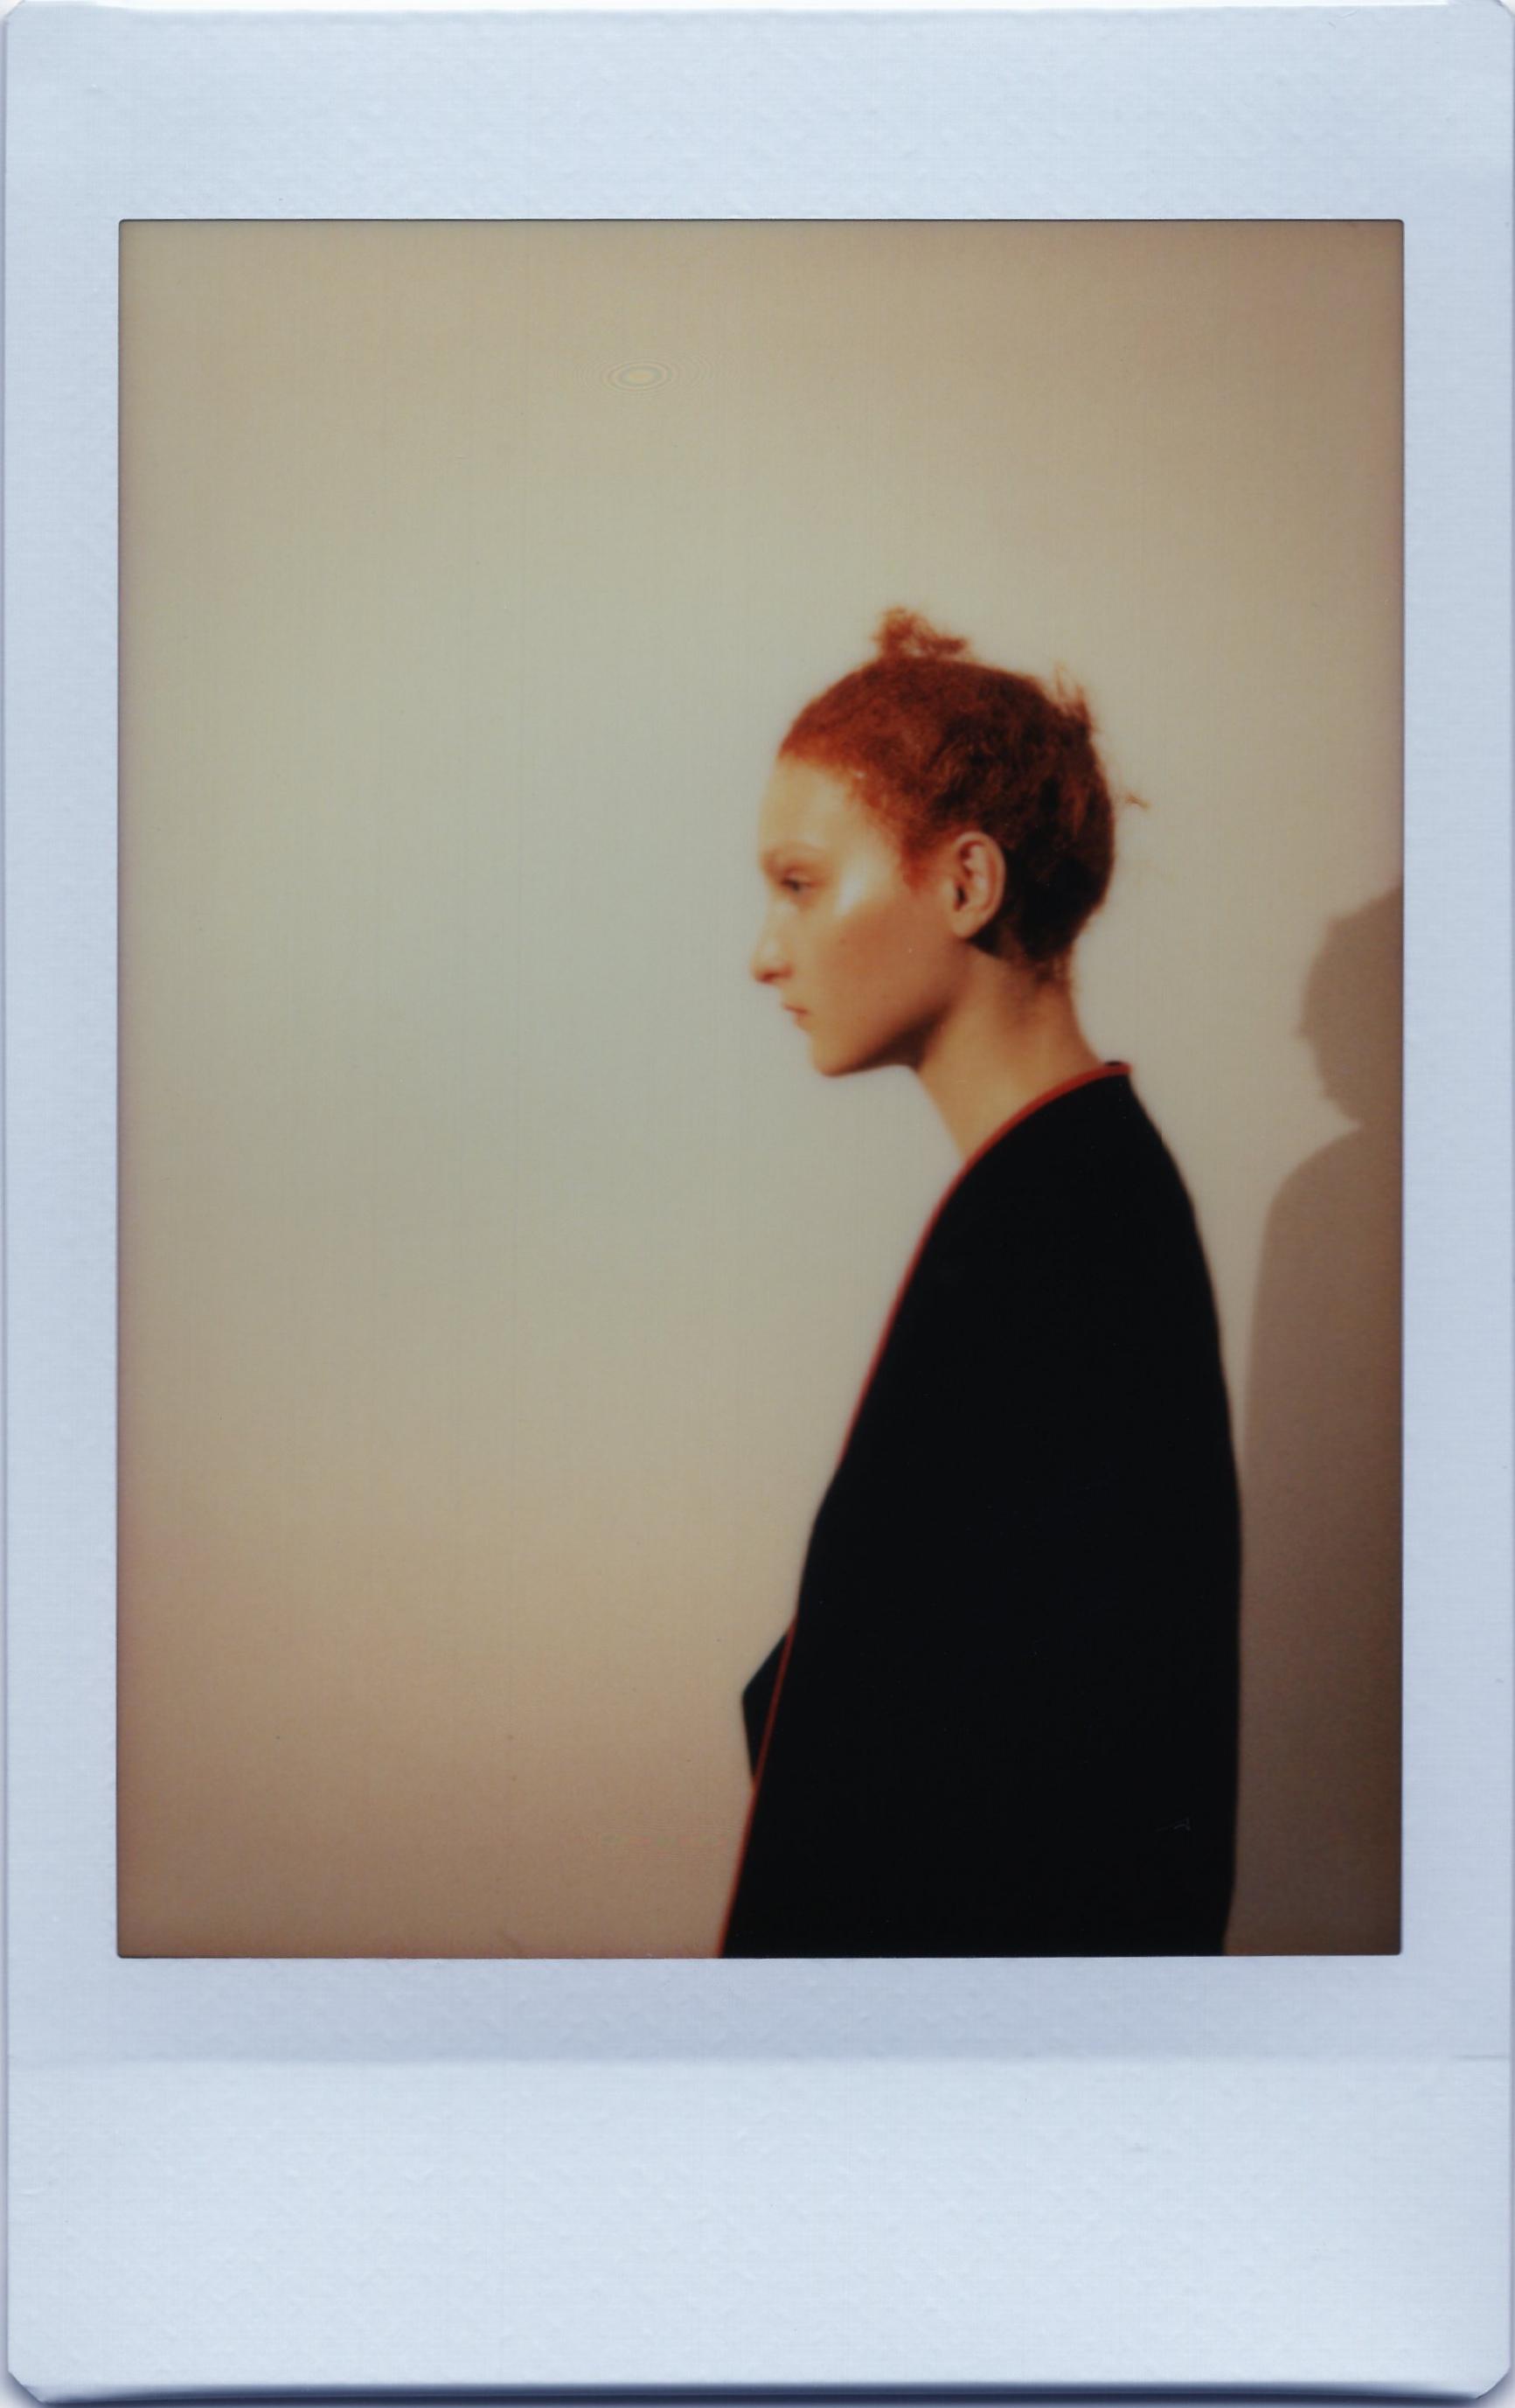 HaiderAckermann_Honigschreck_Polaroid_6.jpg